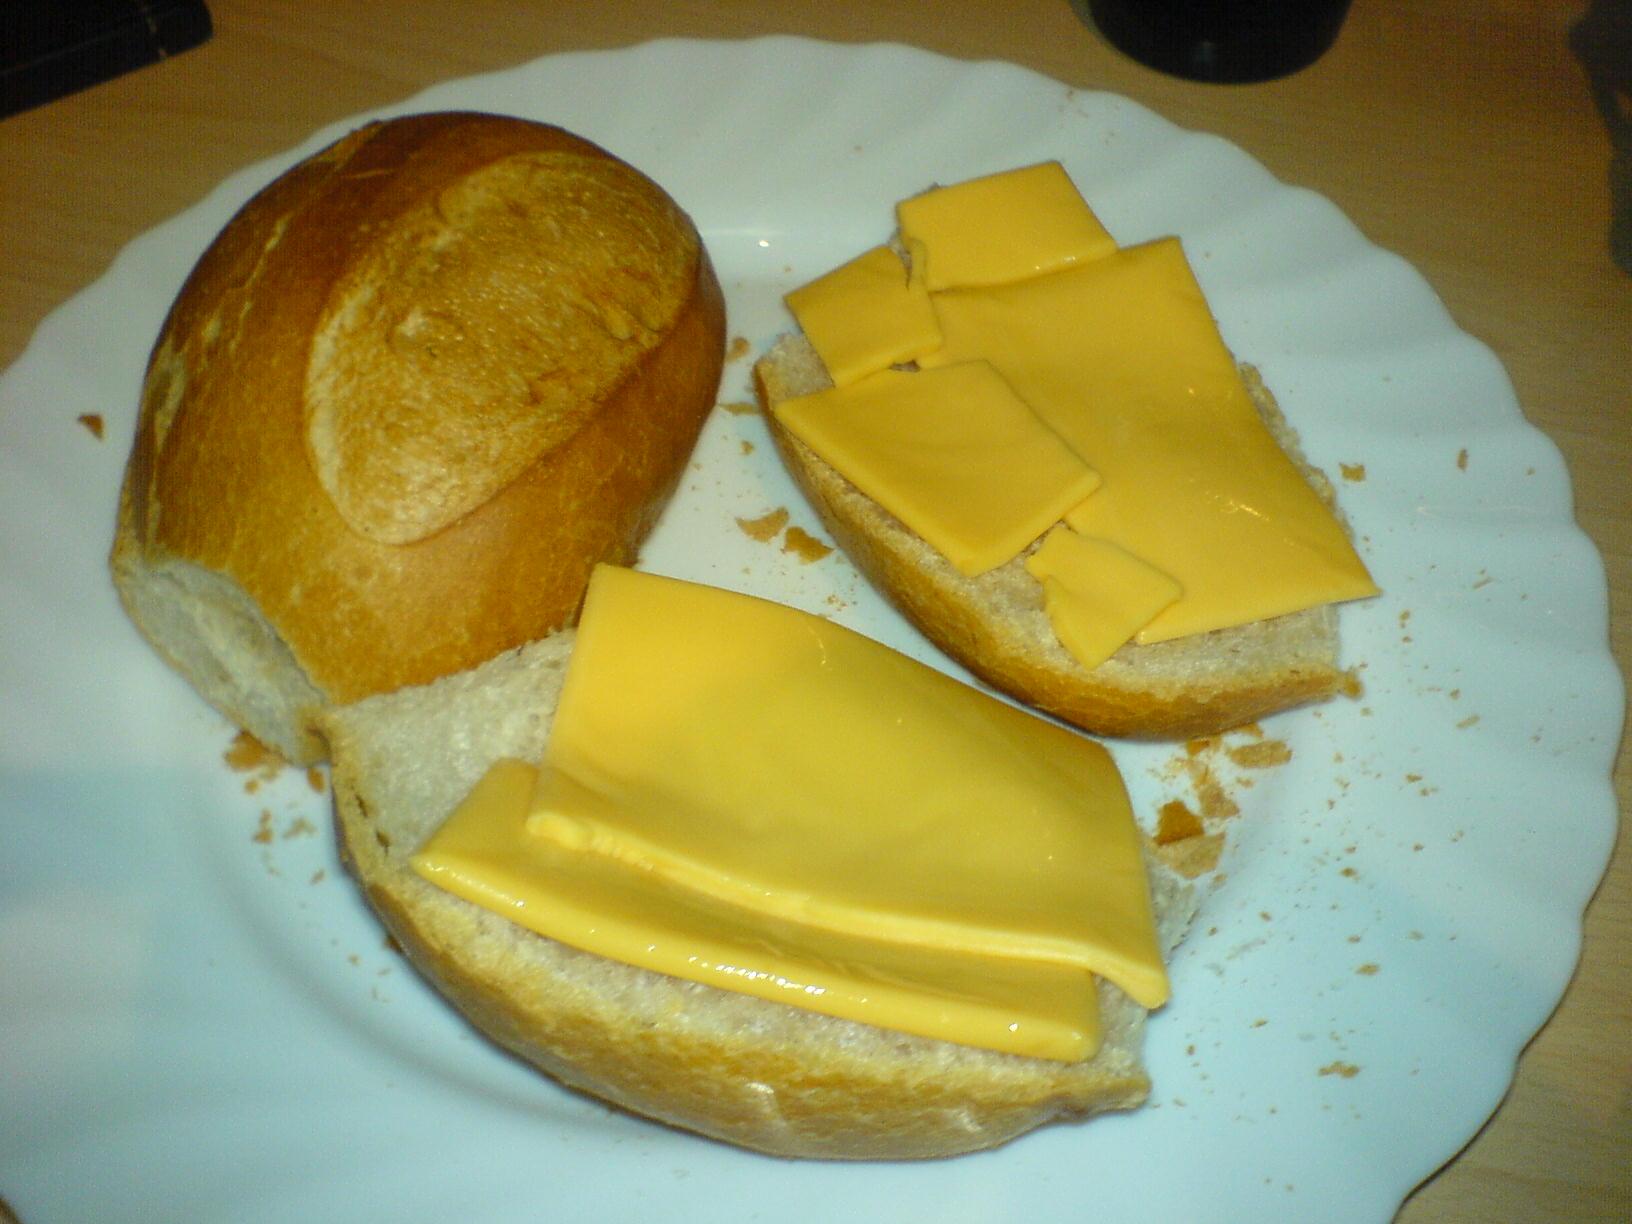 http://foodloader.net/Holz_2006-08-27_Kaesebroetchen.jpg